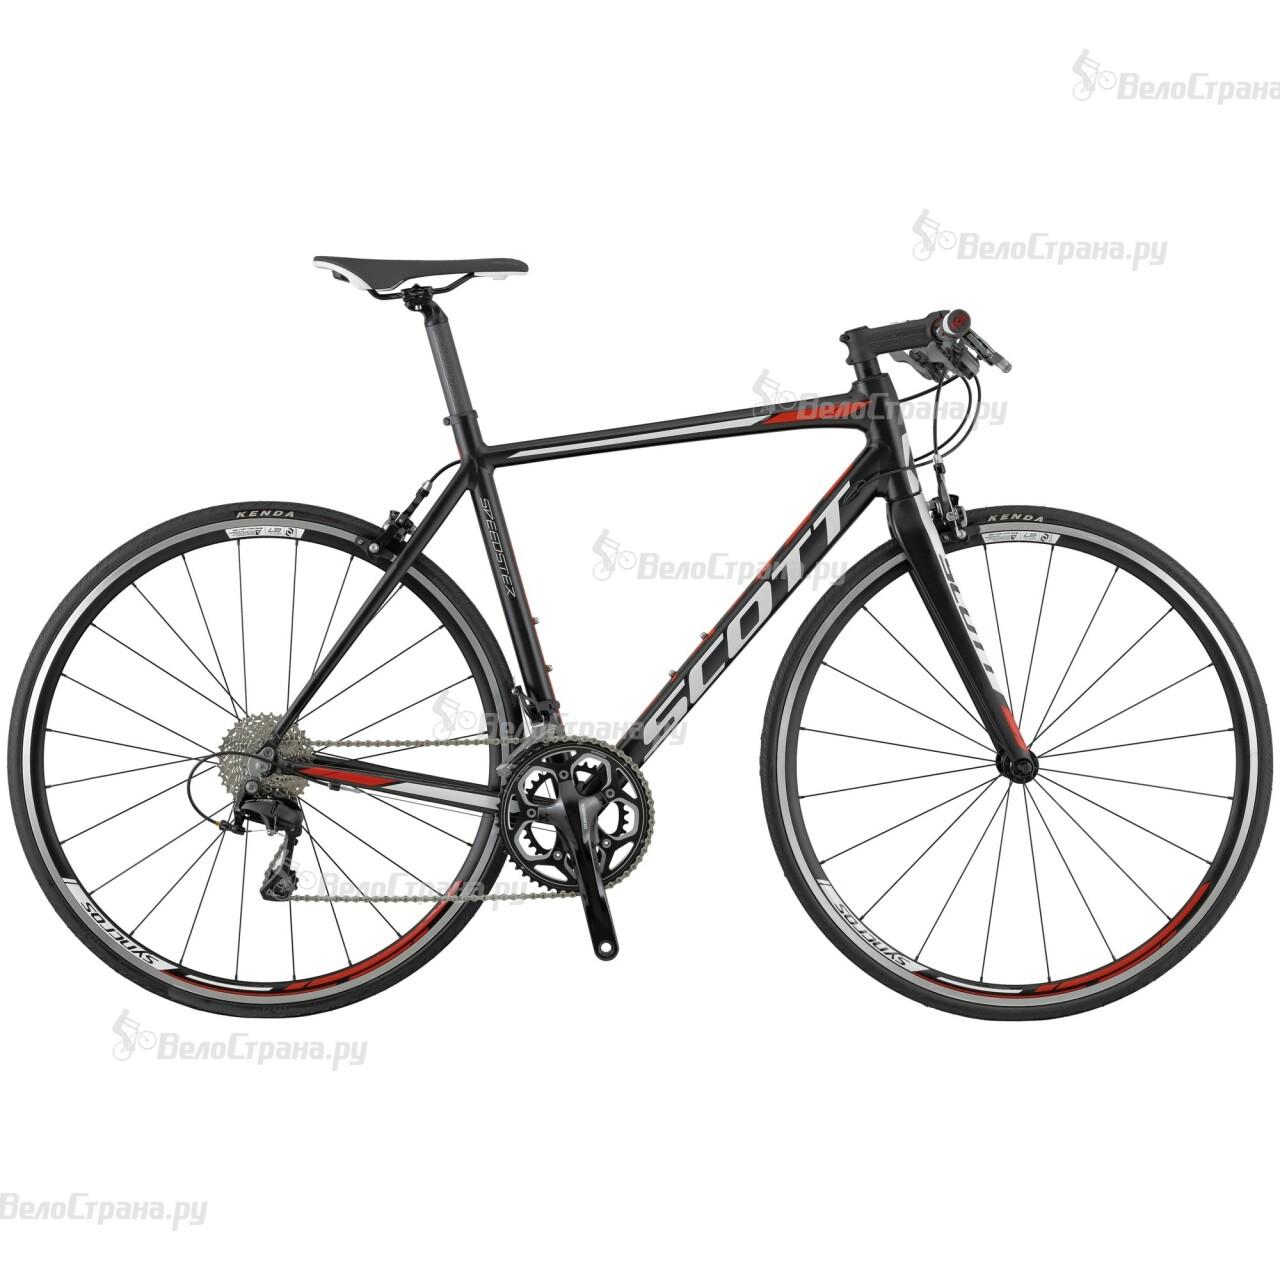 Велосипед Scott Speedster 20 FB (2016) велосипед scott speedster cx 20 disc 28 2016